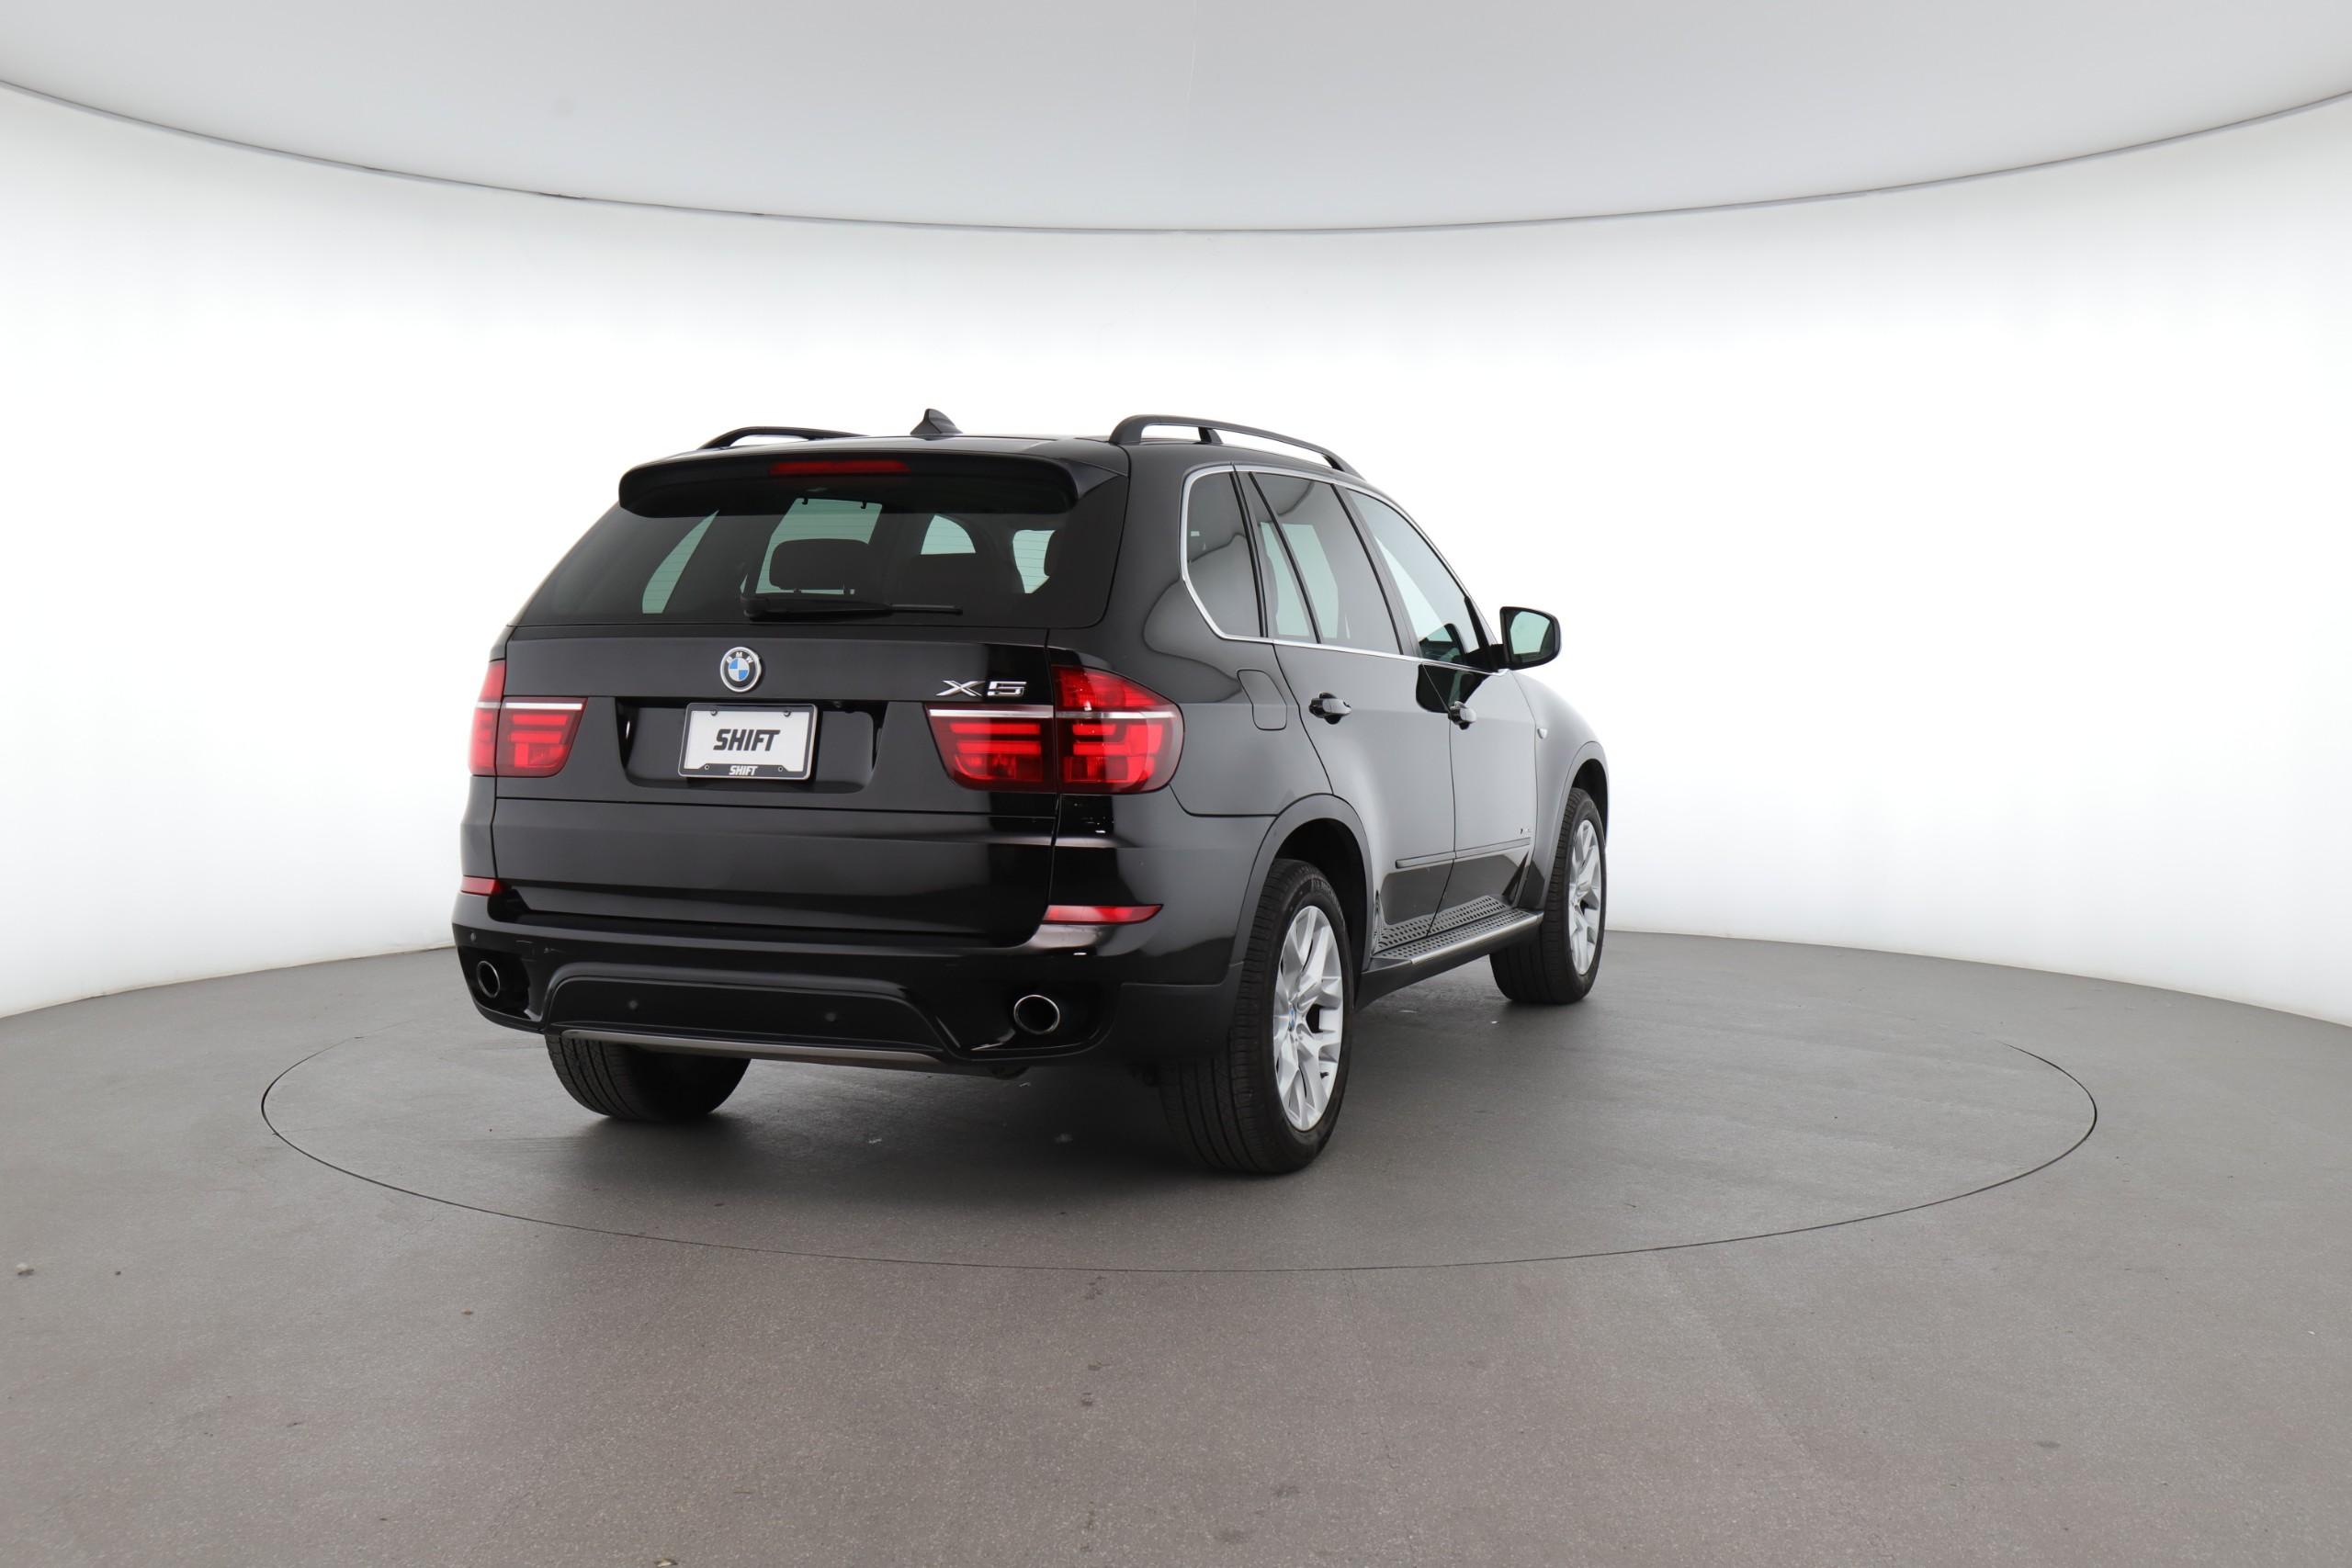 2013 BMW X5 xDrive35i Premium (from $19,950)